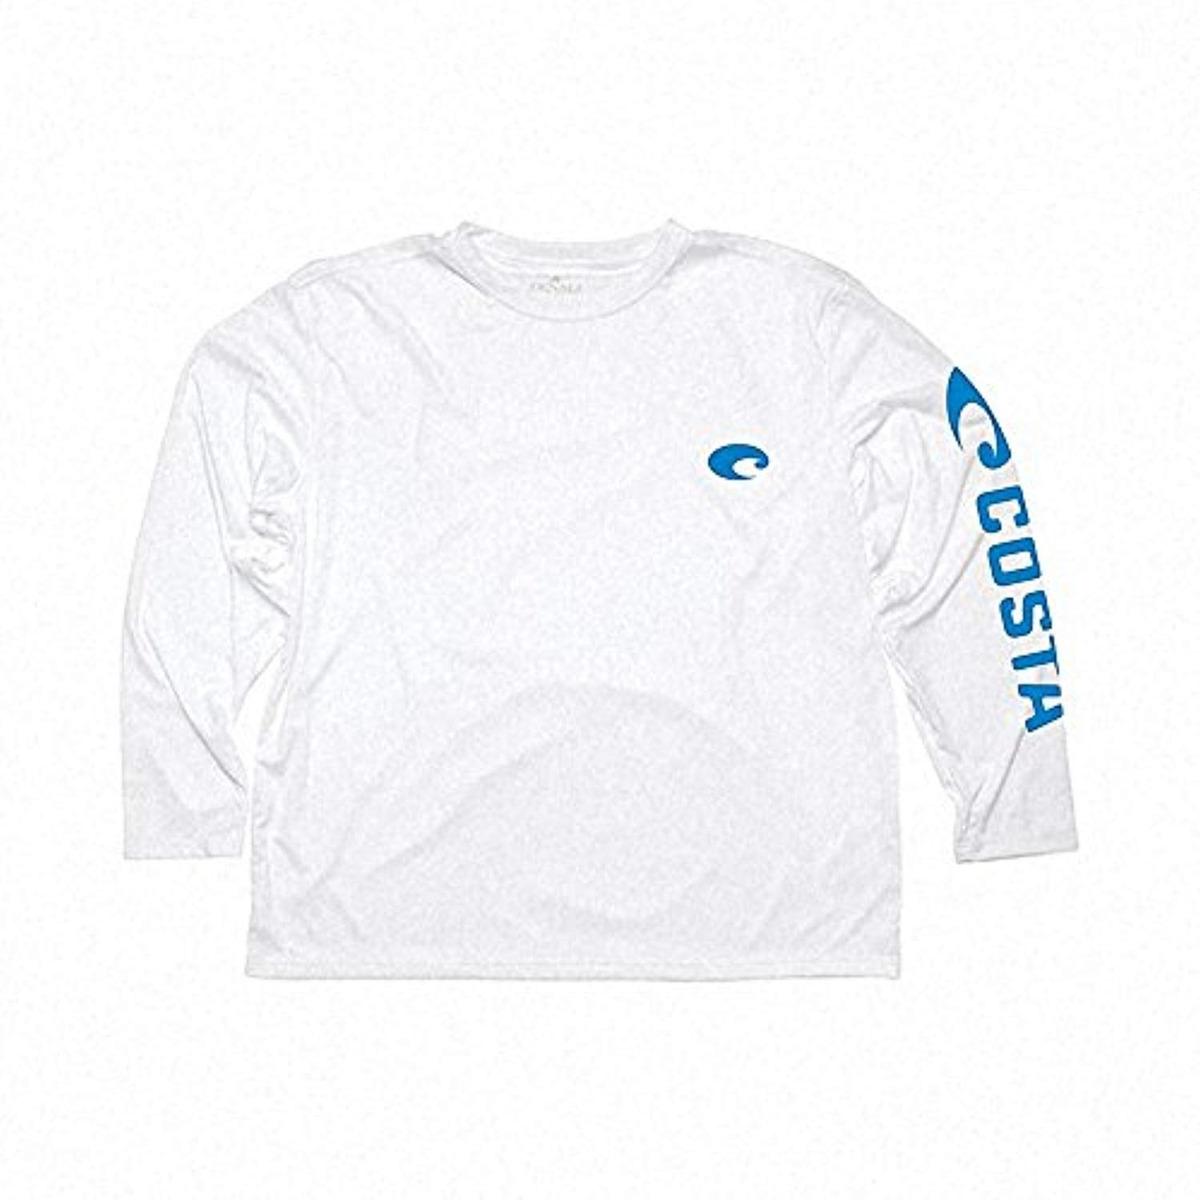 847a0504be84 Camisetas Hombre Costa Del Mar Technical - $ 303.599 en Mercado ...